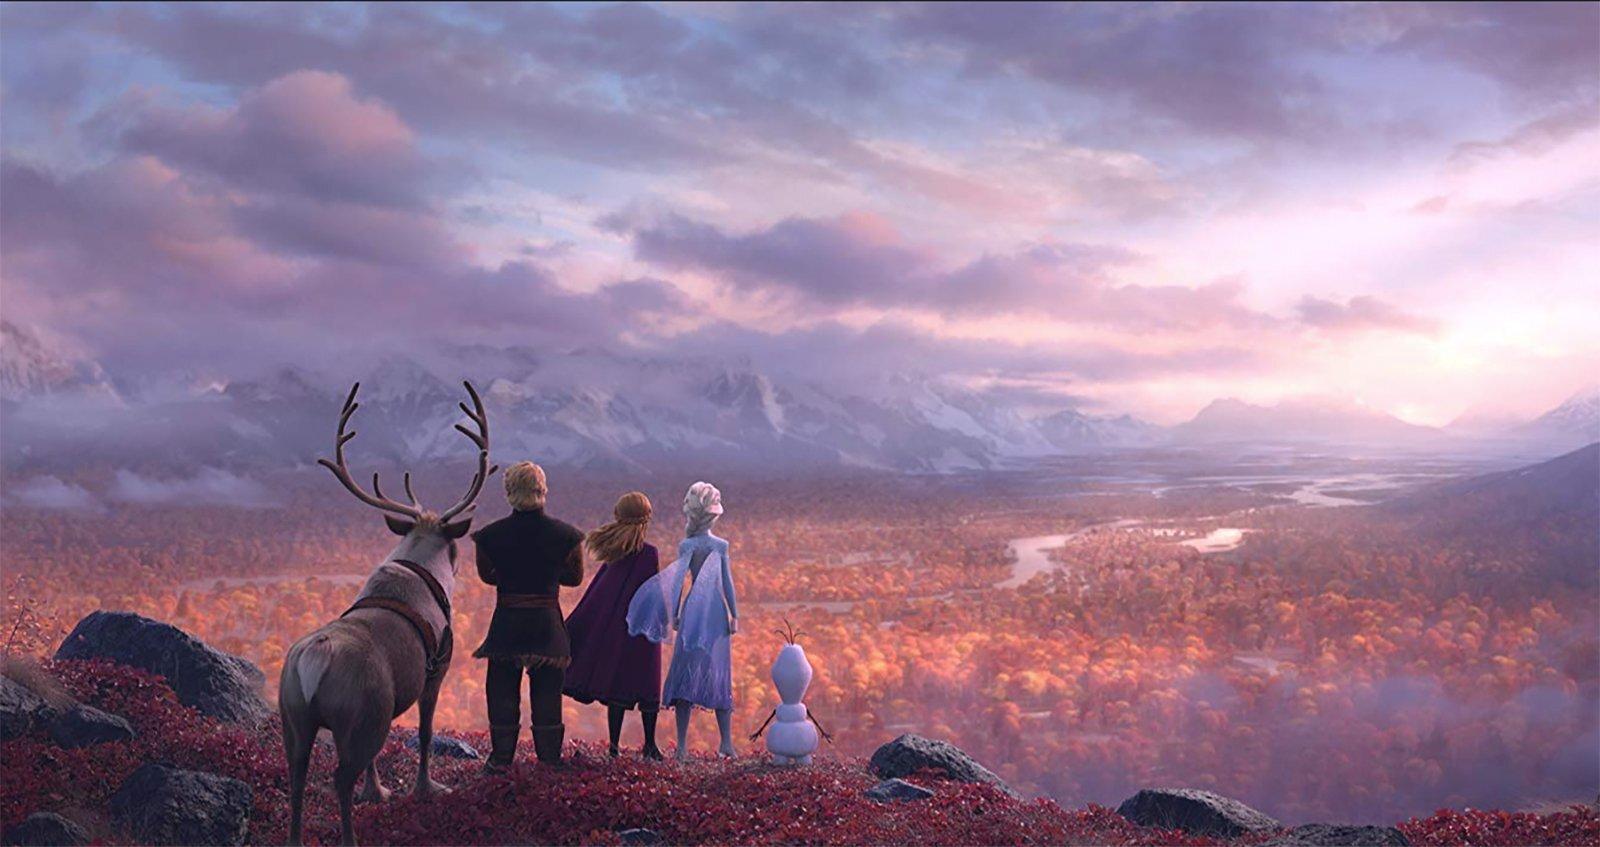 Photos: 'Frozen 2' nabs a record box office forDisney